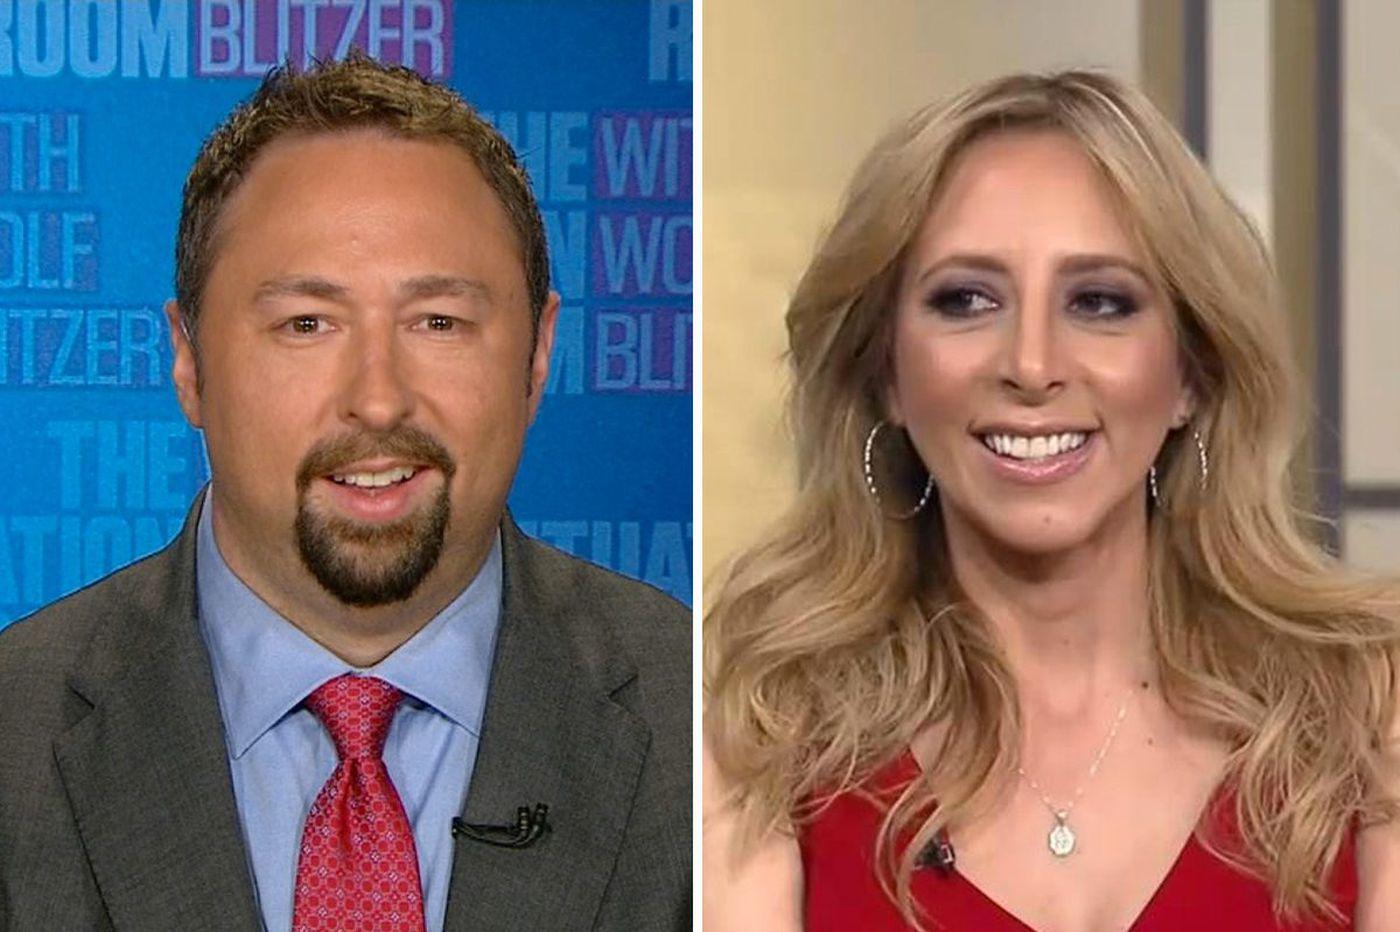 Ex-Trump staffer Jason Miller sues Gizmodo after losing CNN job over explosive abortion allegation